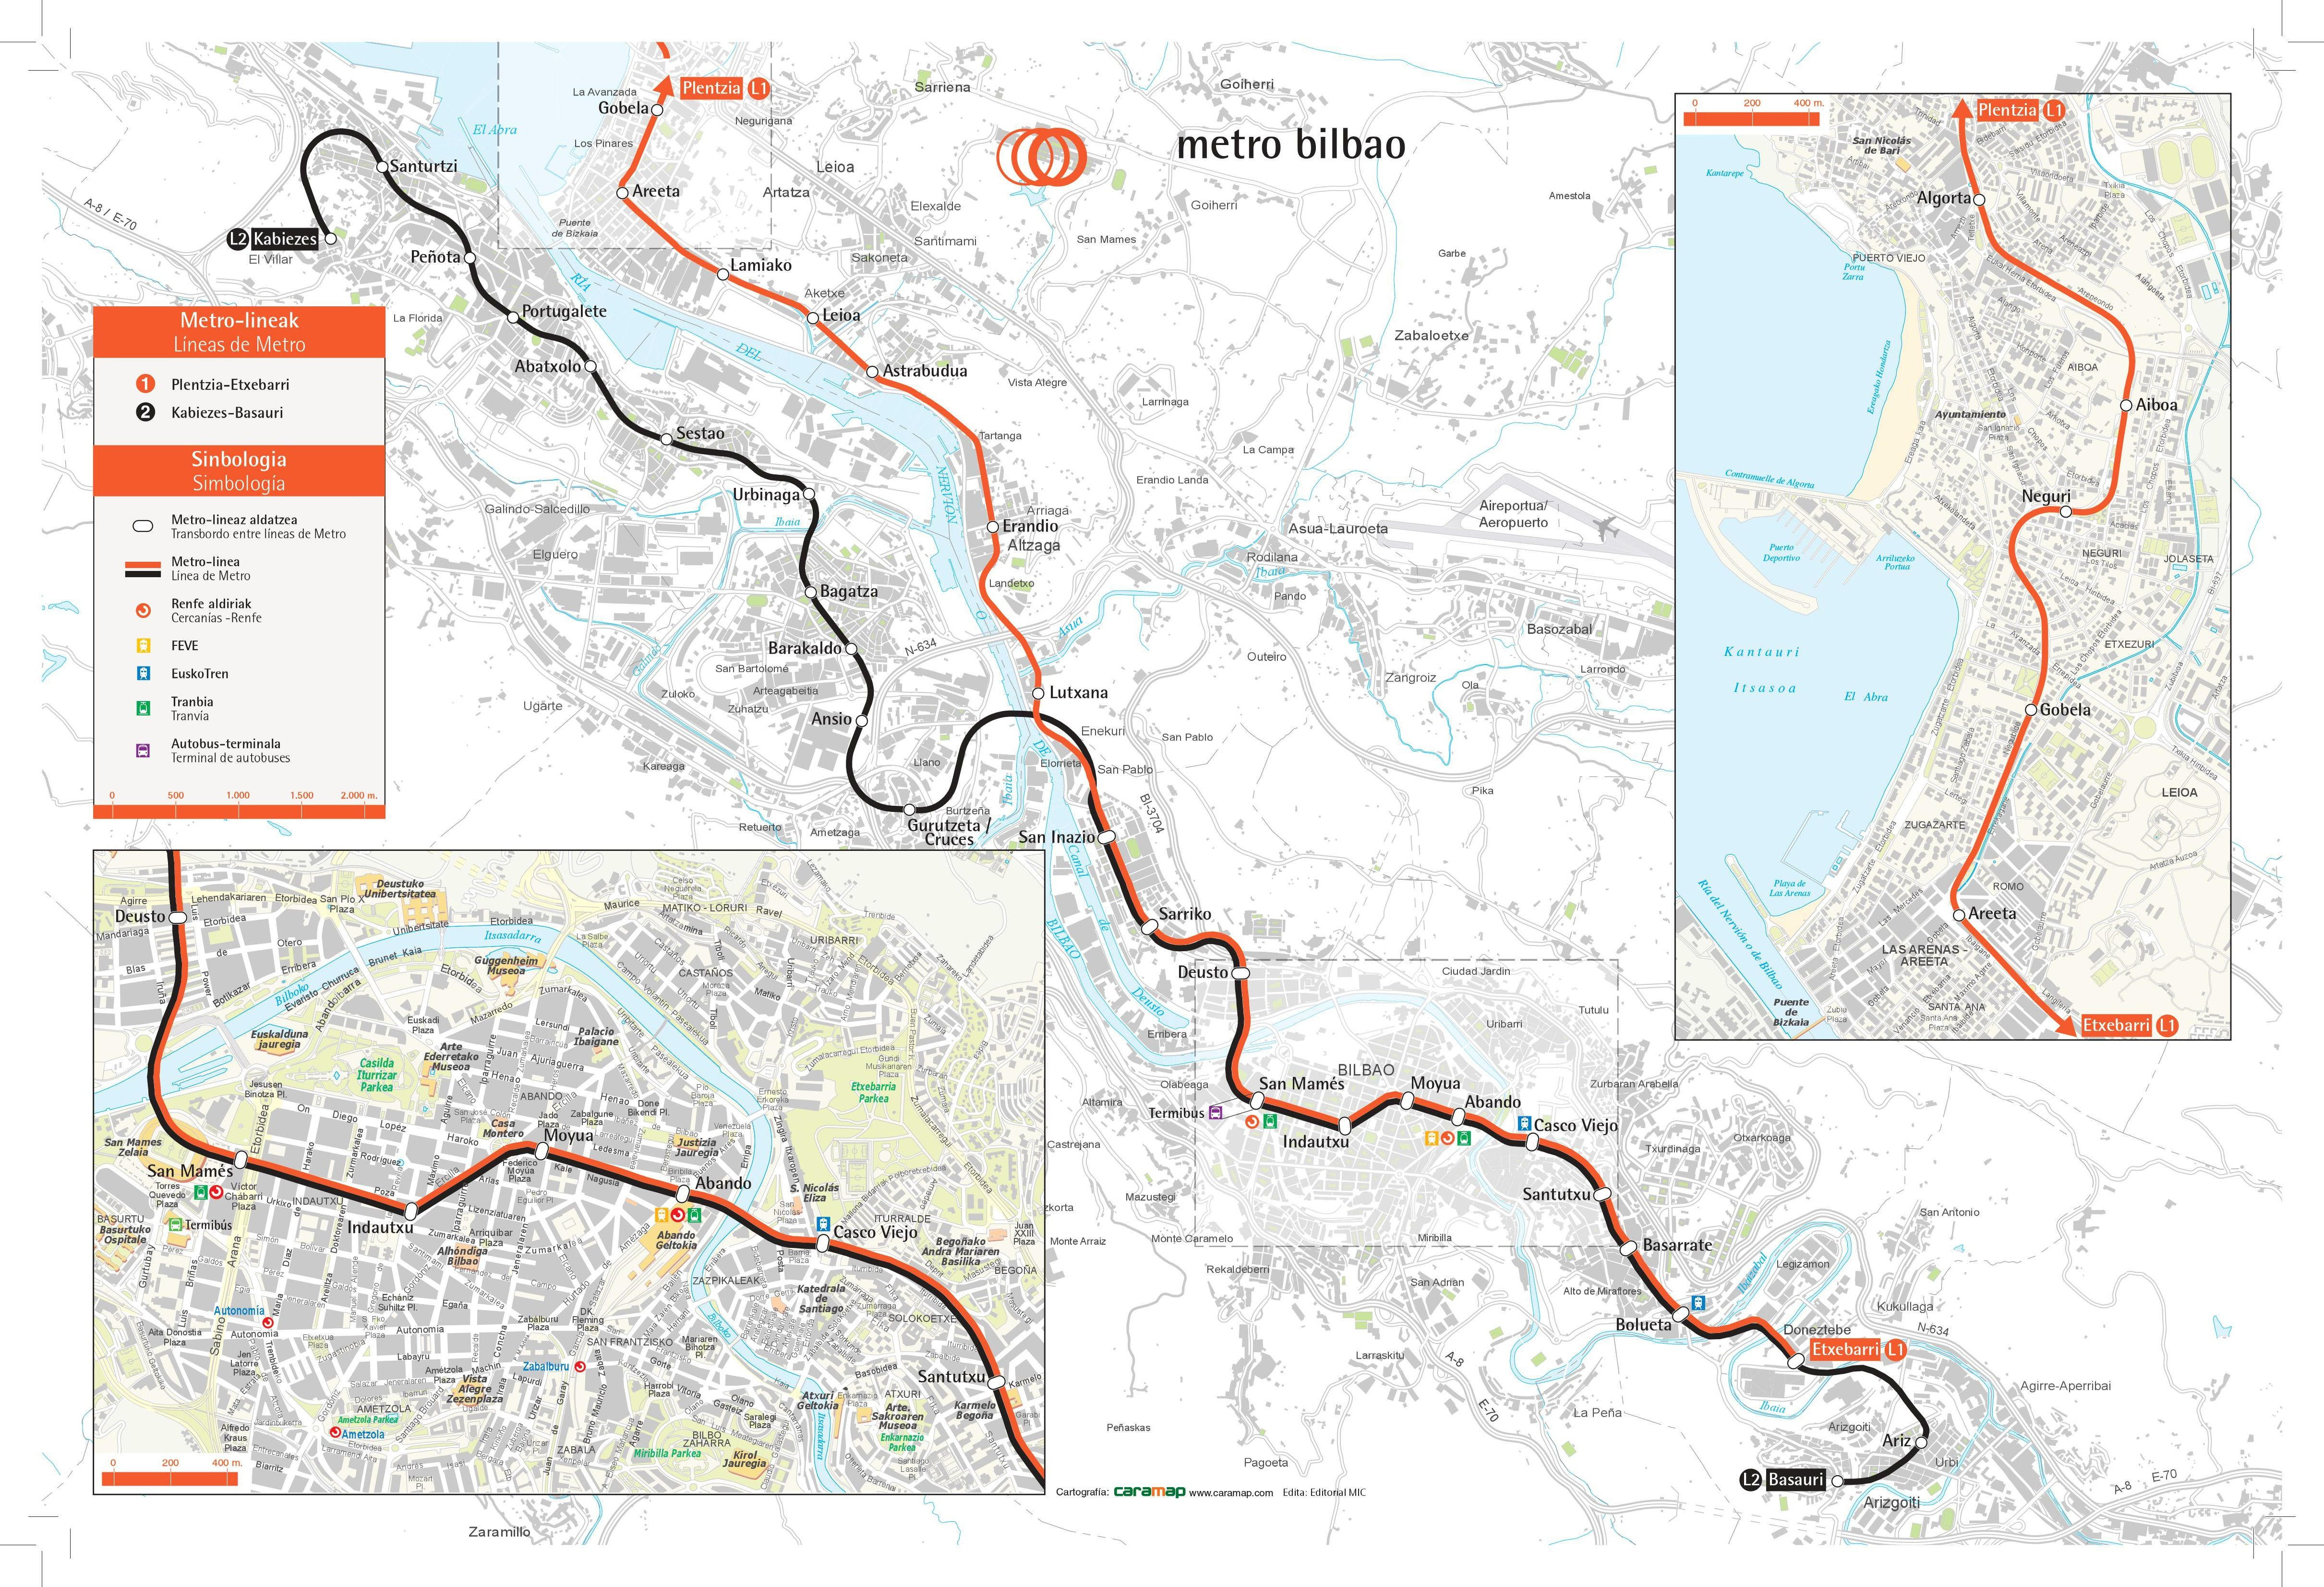 Mapa Portugal - mapas, planos interactivos - ViaMichelin